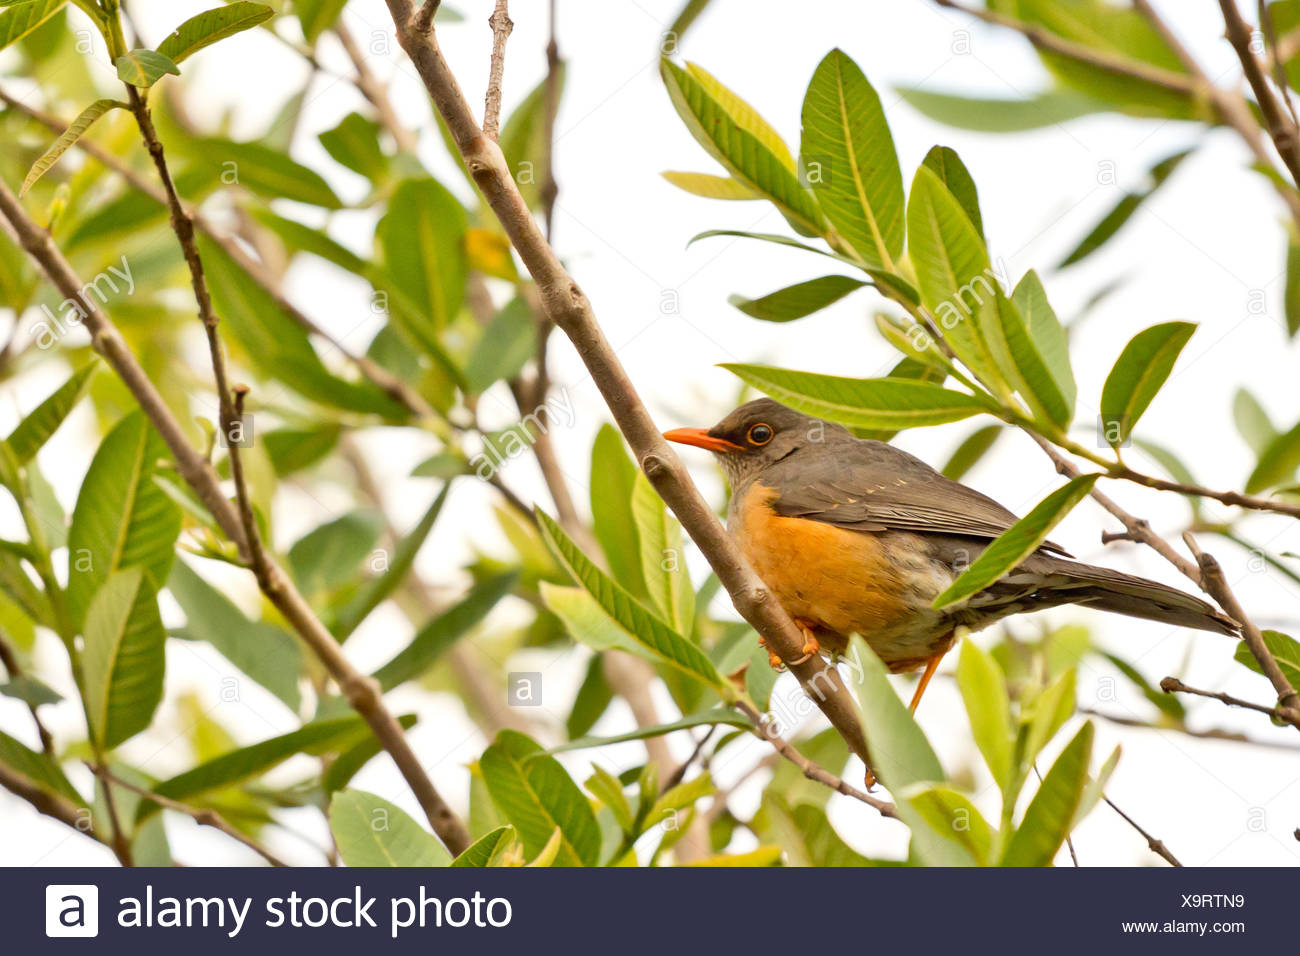 Small orange beak bird - Stock Image